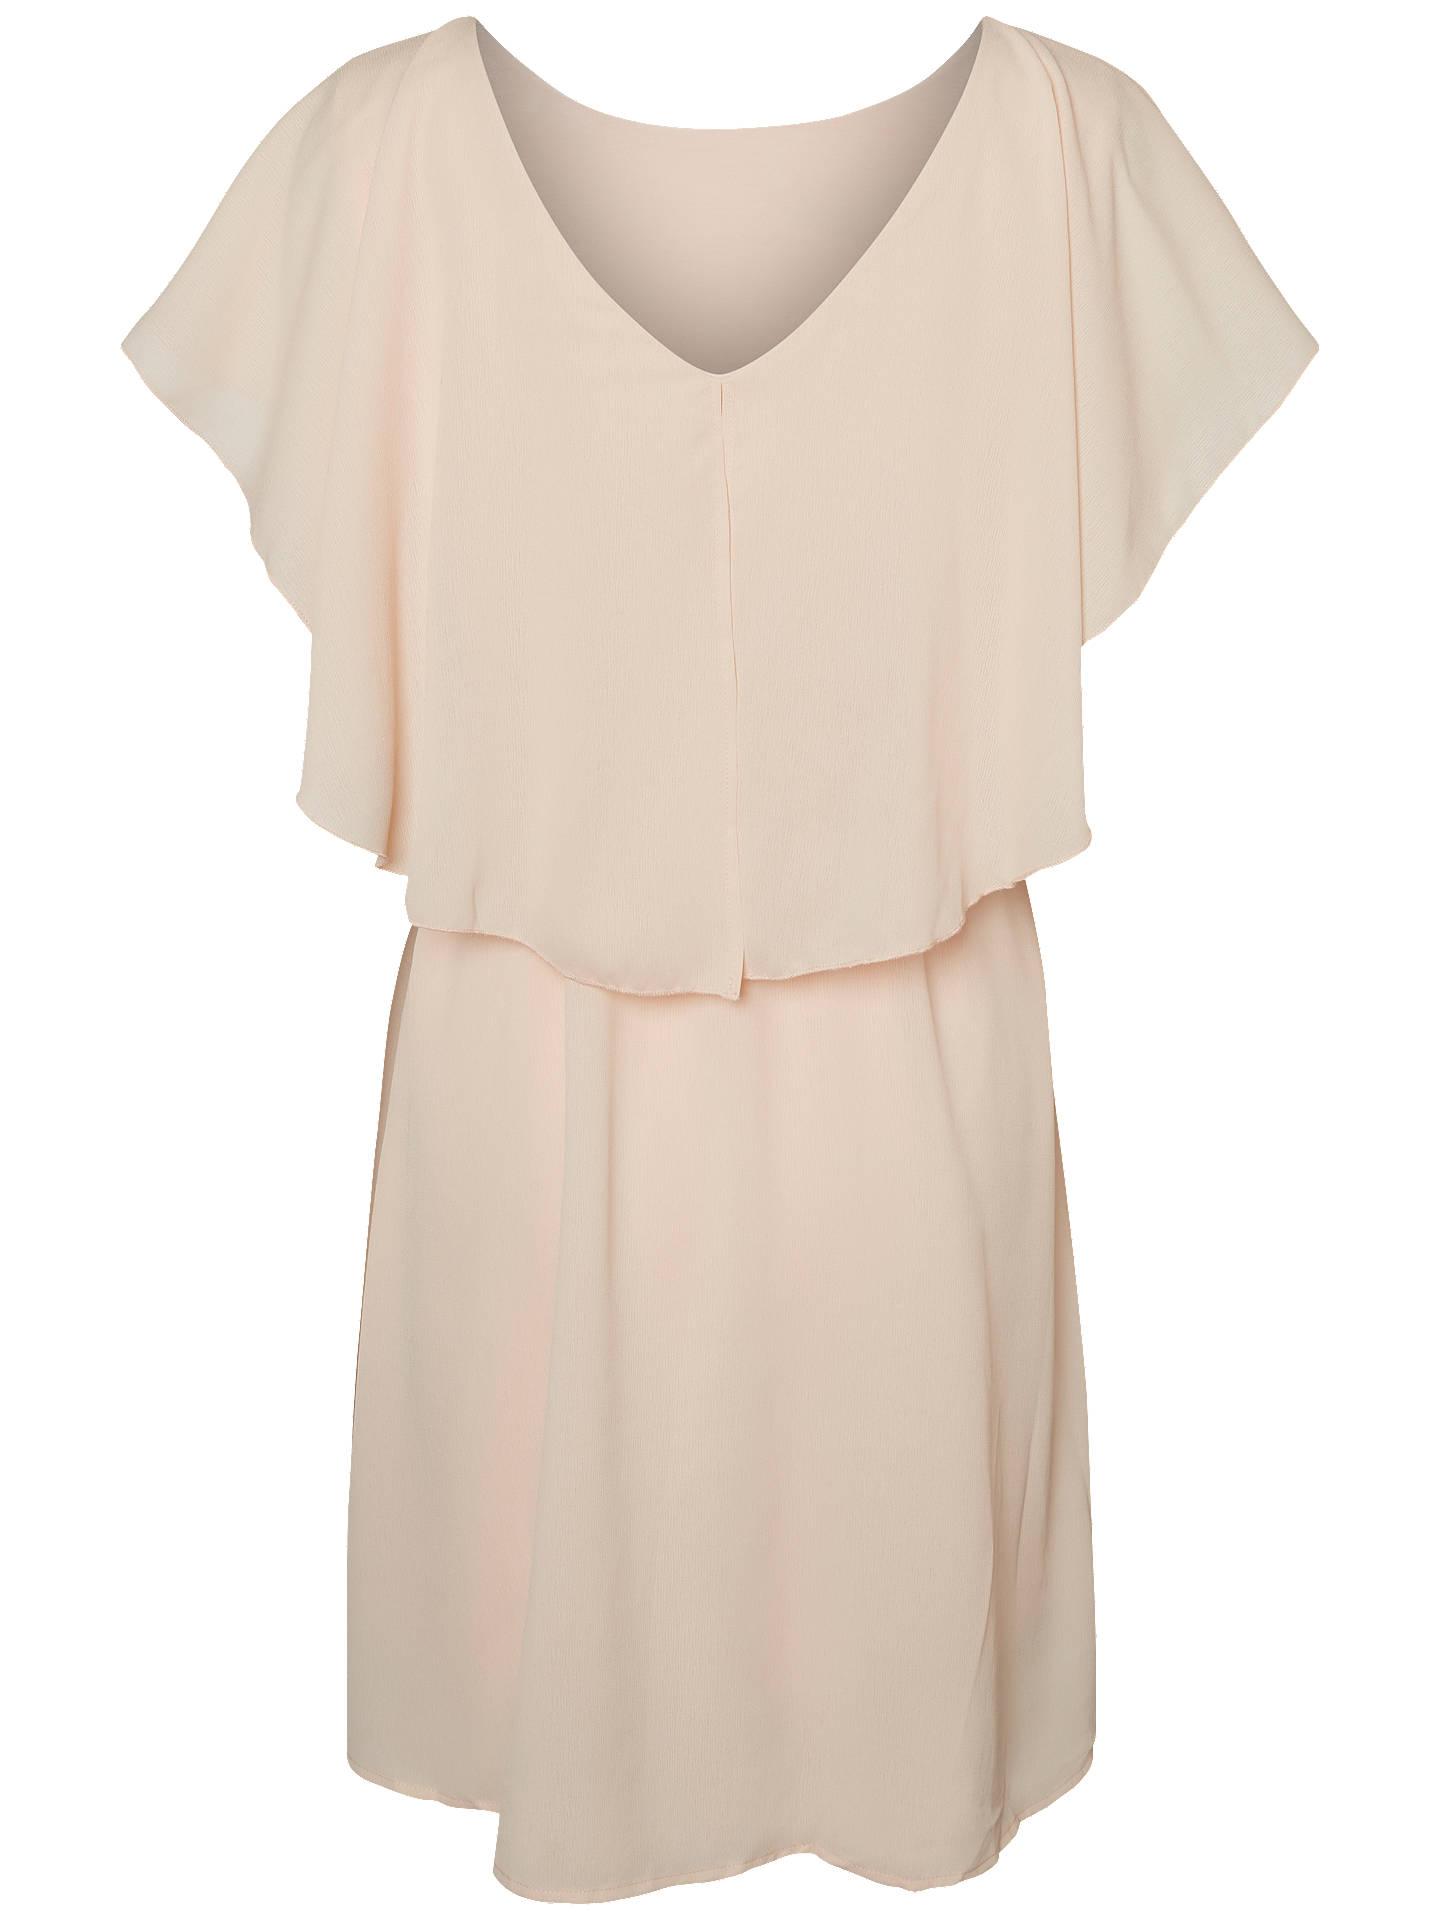 9c826c80a6408 Buy Mamalicious Kena June Maternity Nursing Dress, Peach, S Online at  johnlewis.com